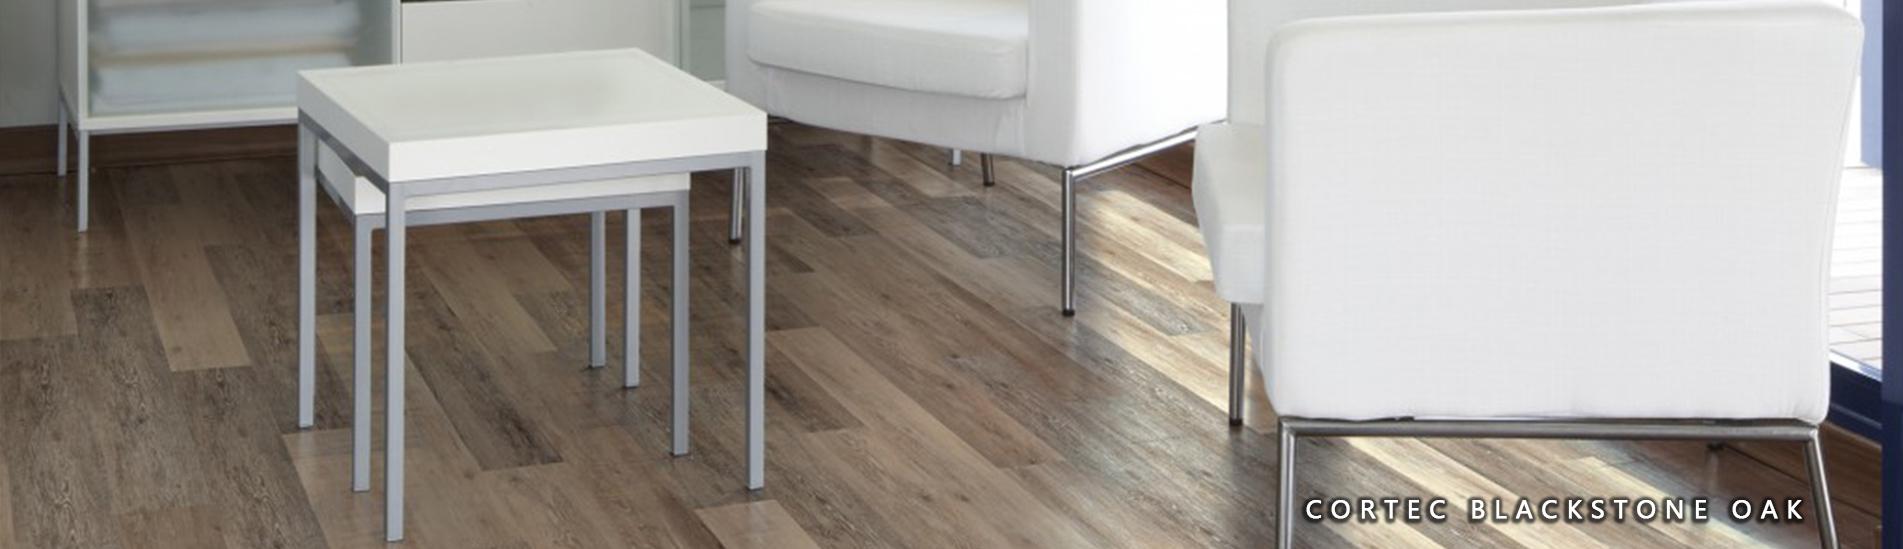 Flooring company in bradenton fl floor installation service 421 dailygadgetfo Image collections